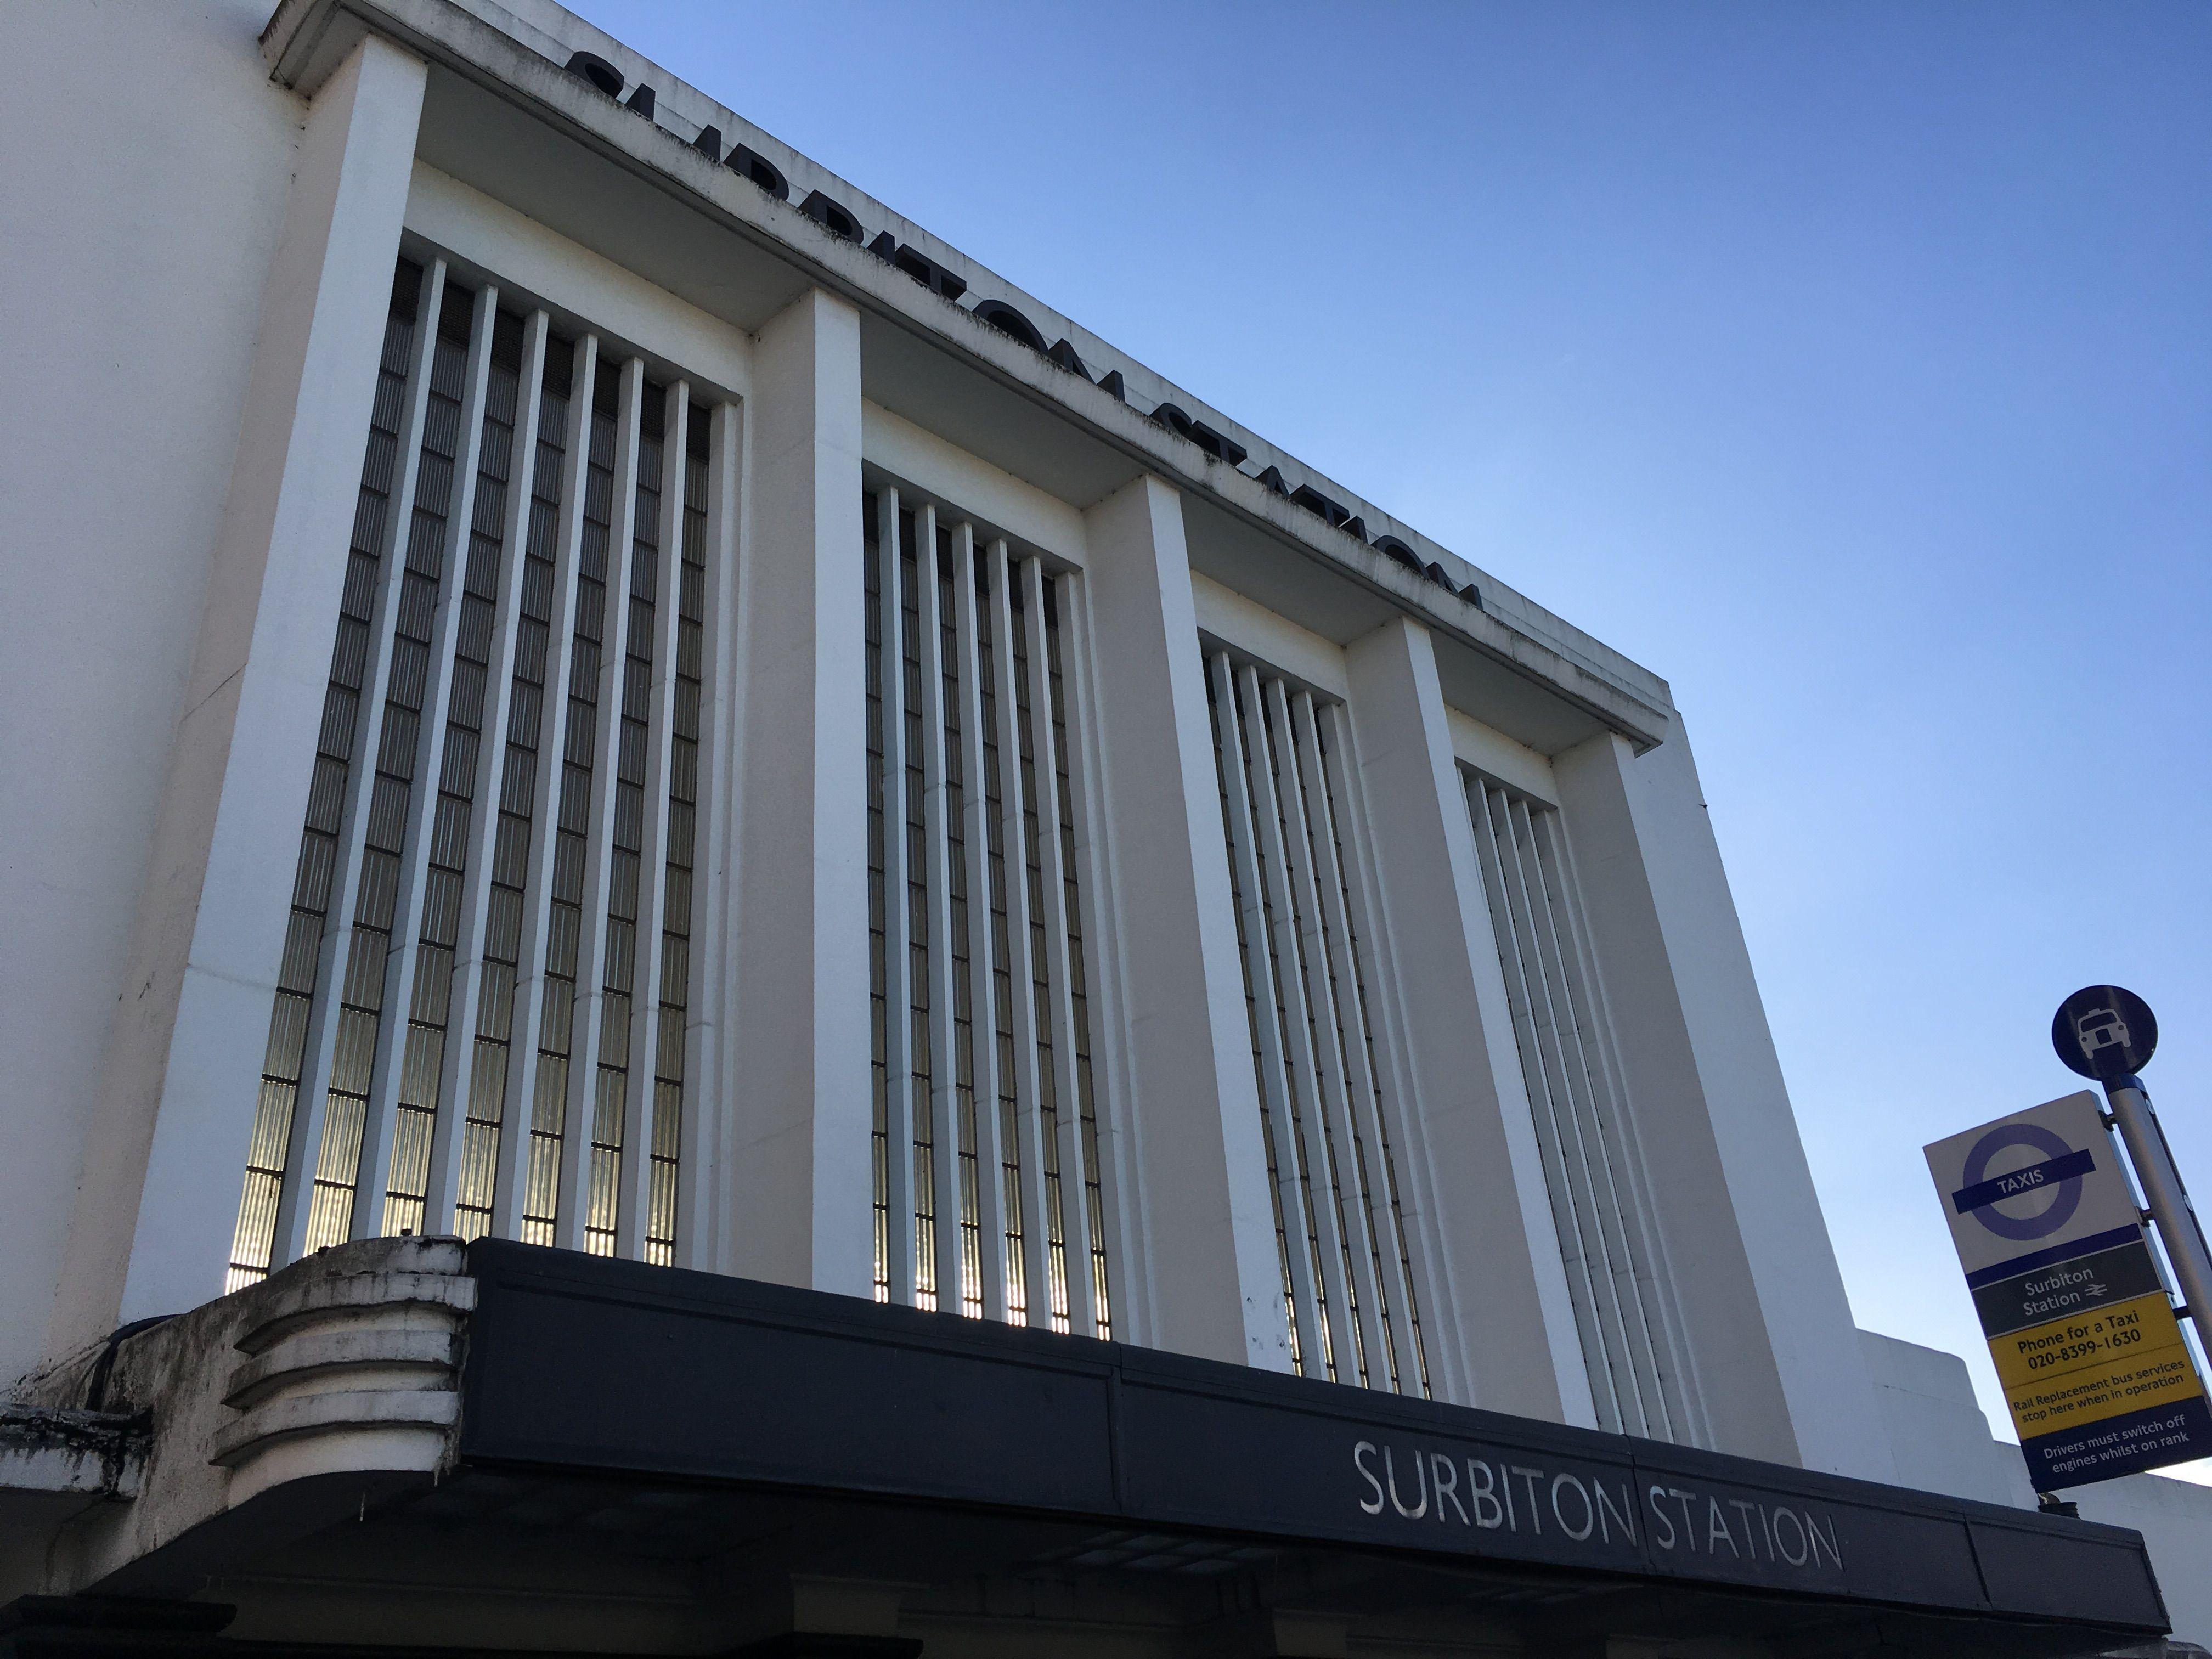 surbiton art deco train station - Google Search | Production & Theming |  Pinterest | Art deco